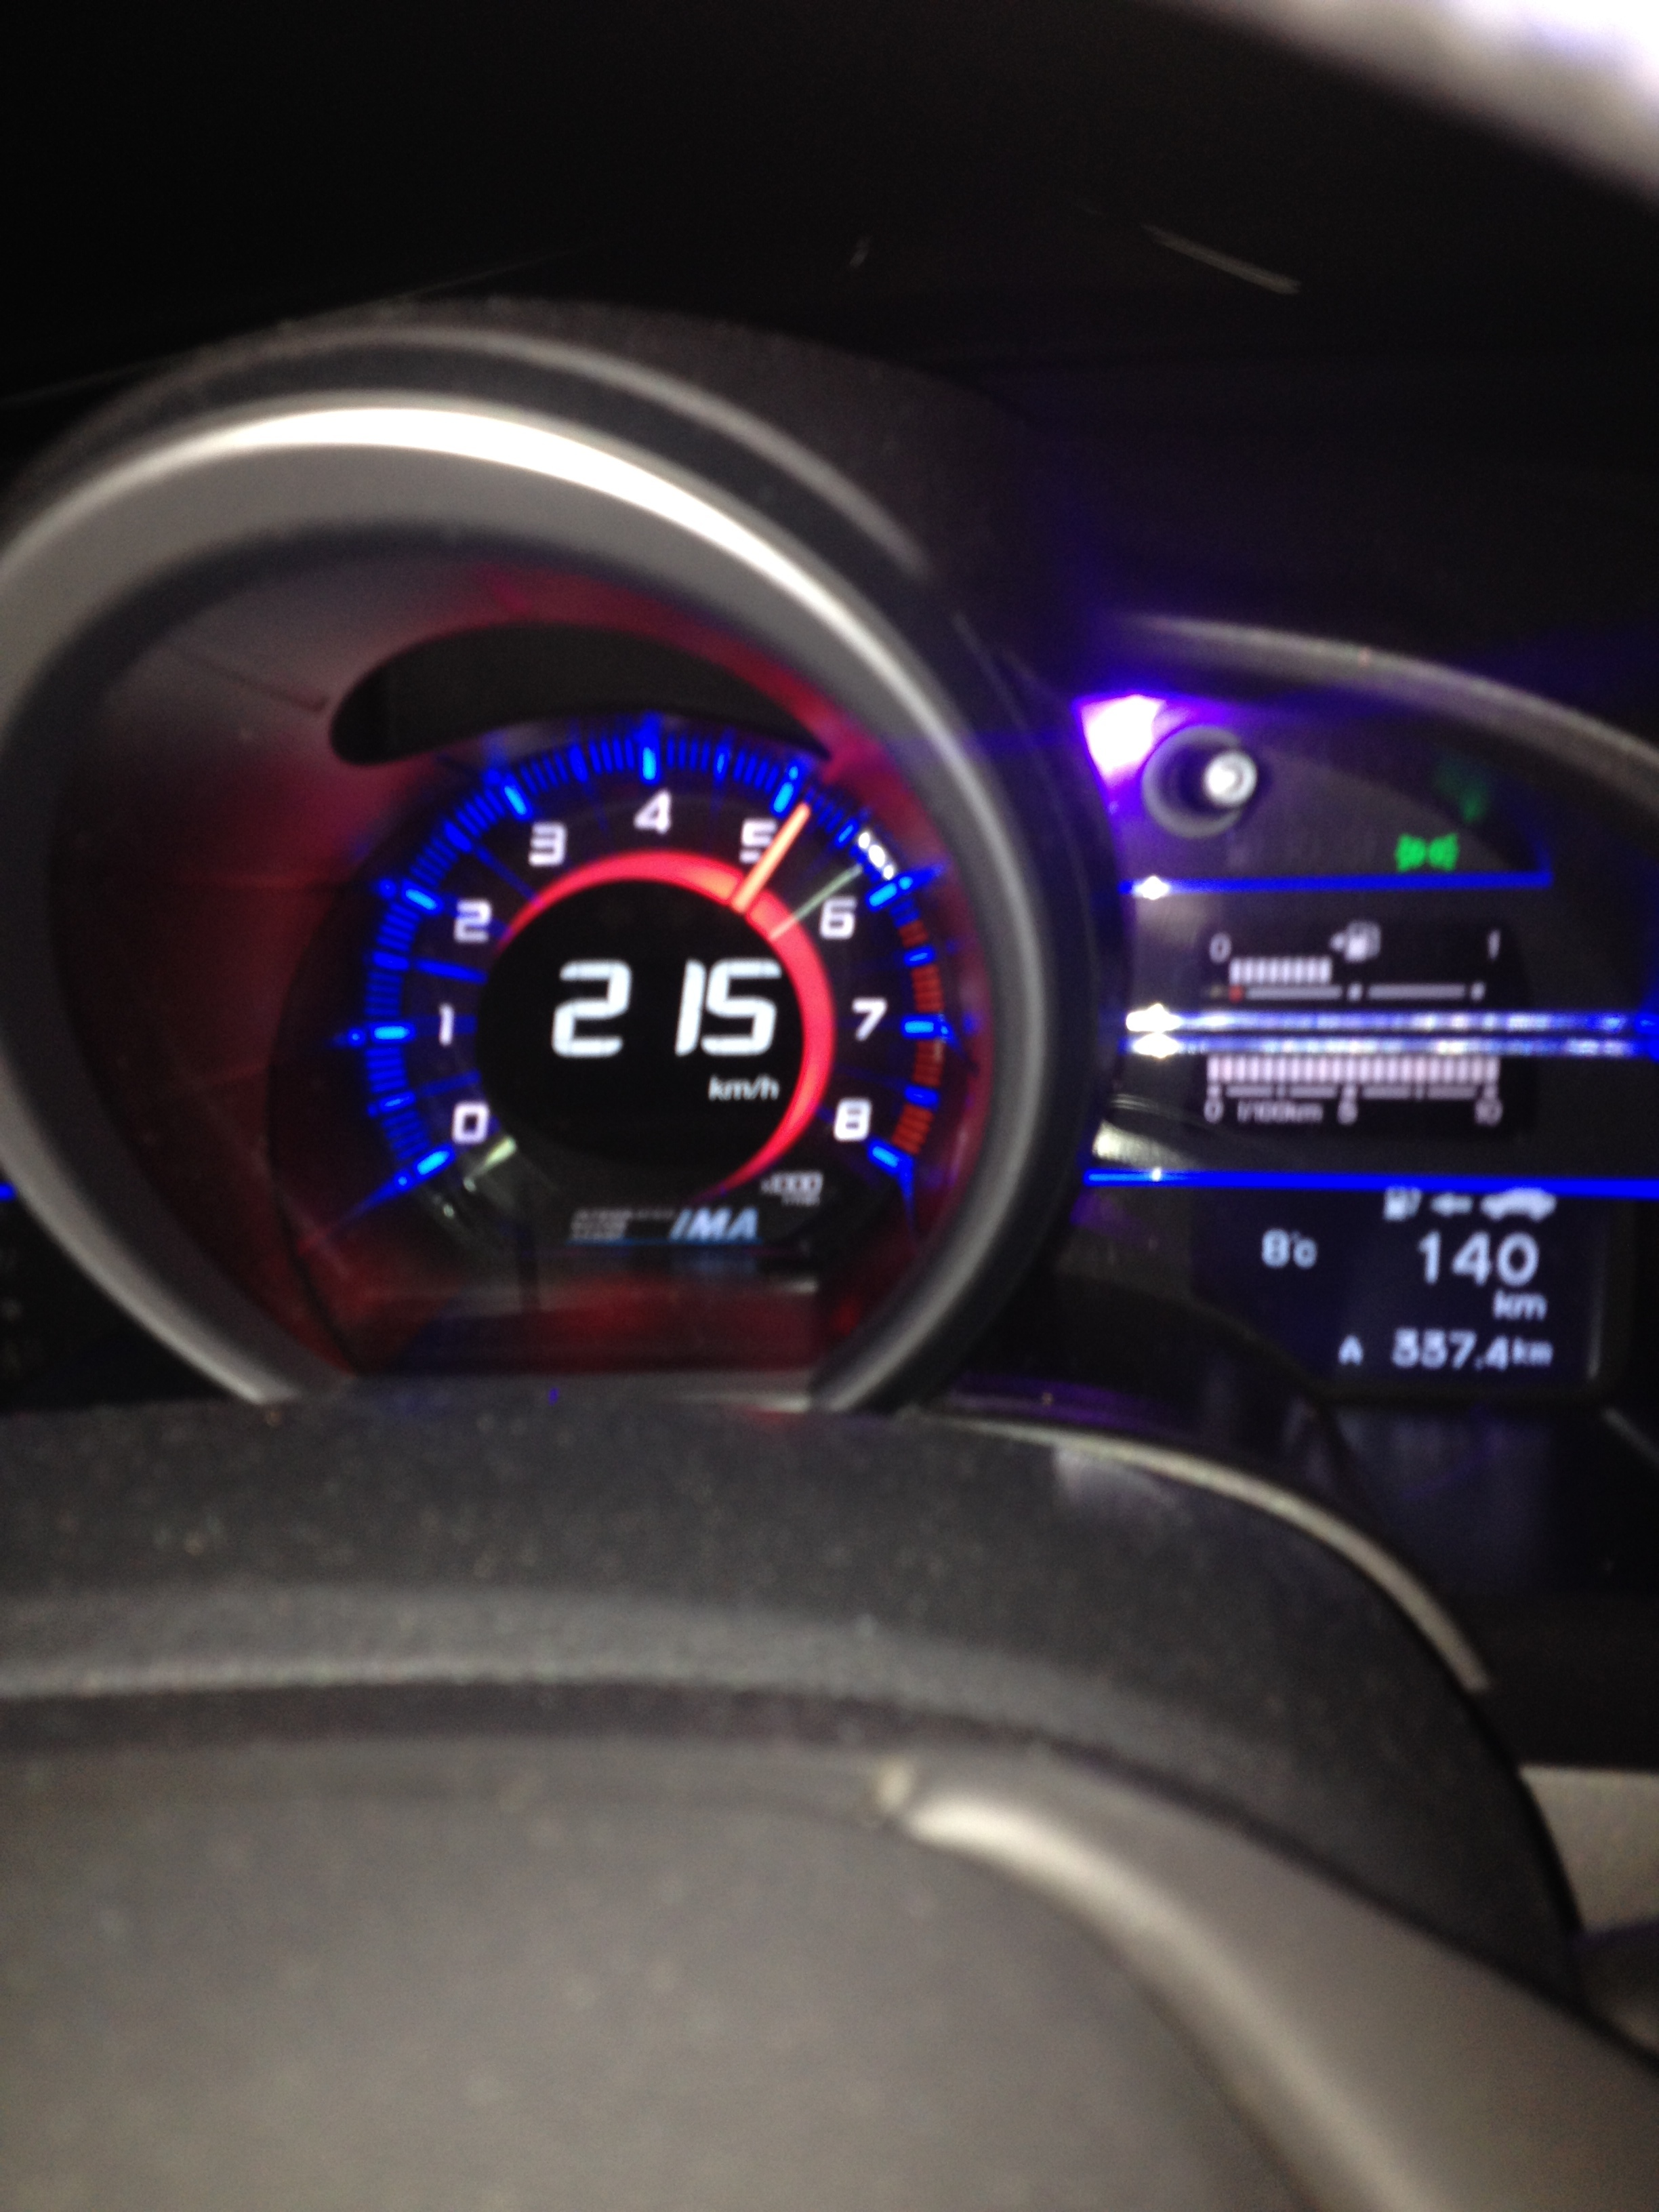 La vitesse maximale atteinte 5nkm1ayj24ky5akzg